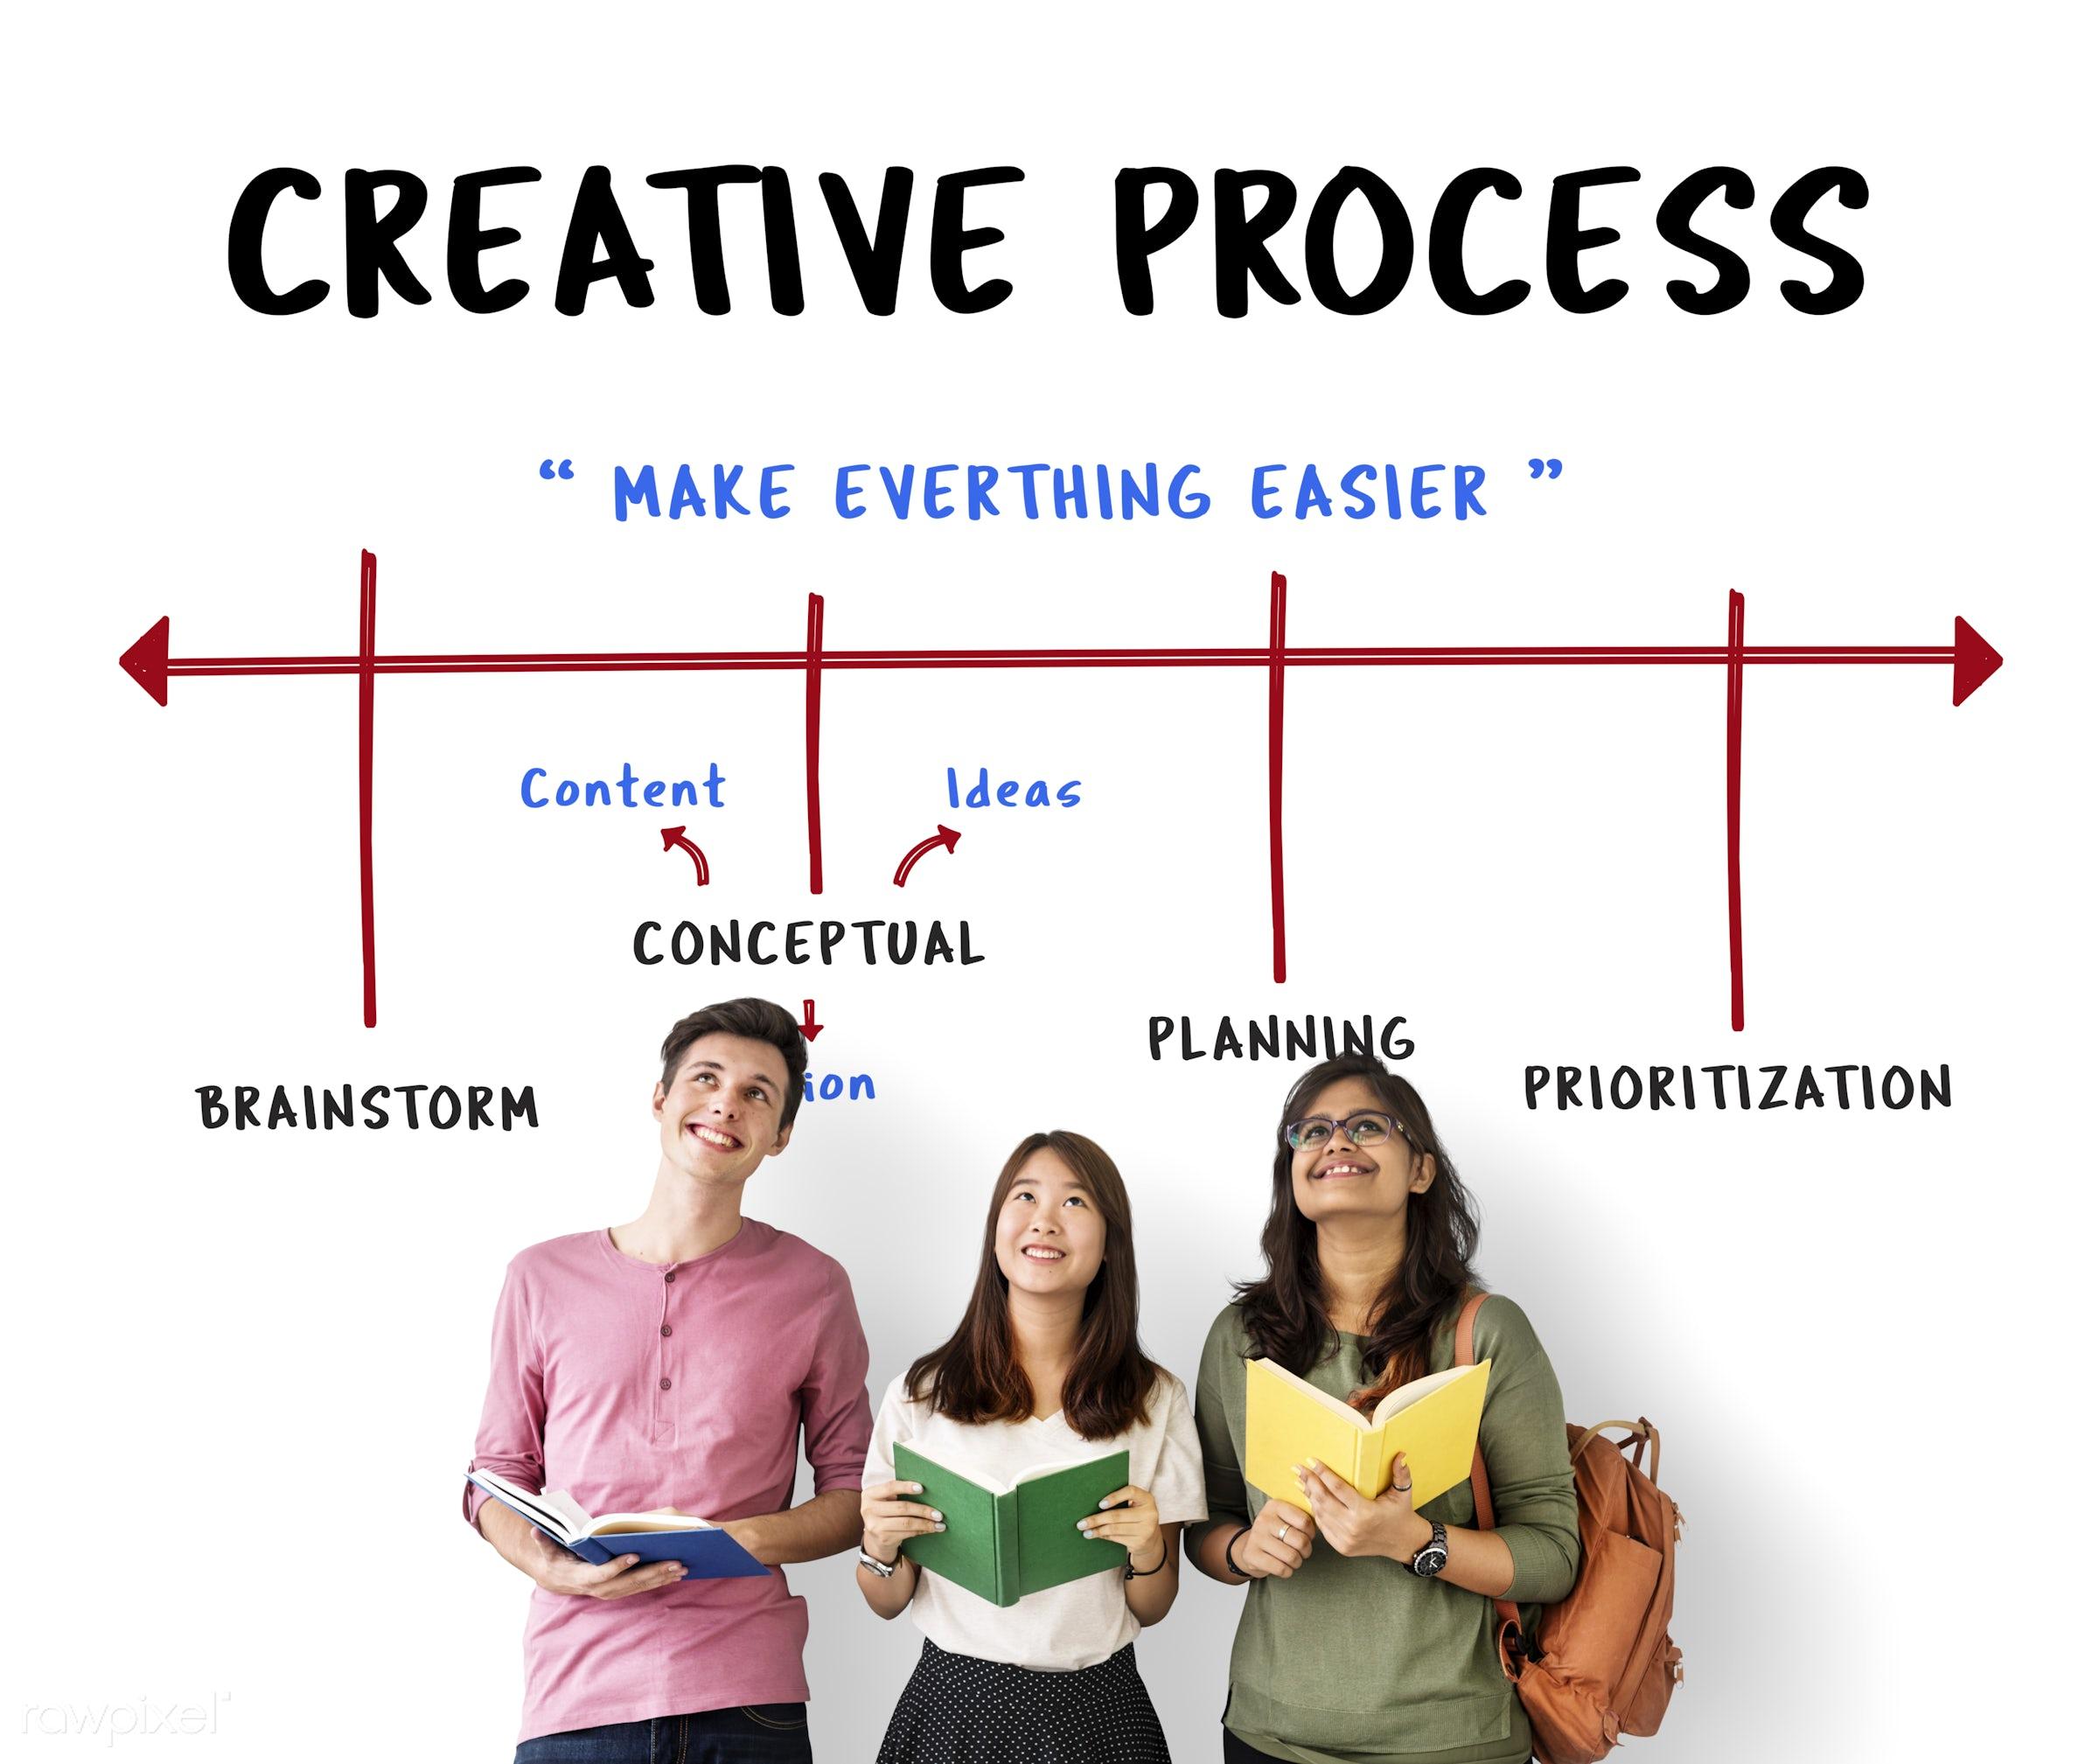 african descent, asian, book, brainstorm, caucasian, chart, communication, connection, creative, creativity, design,...